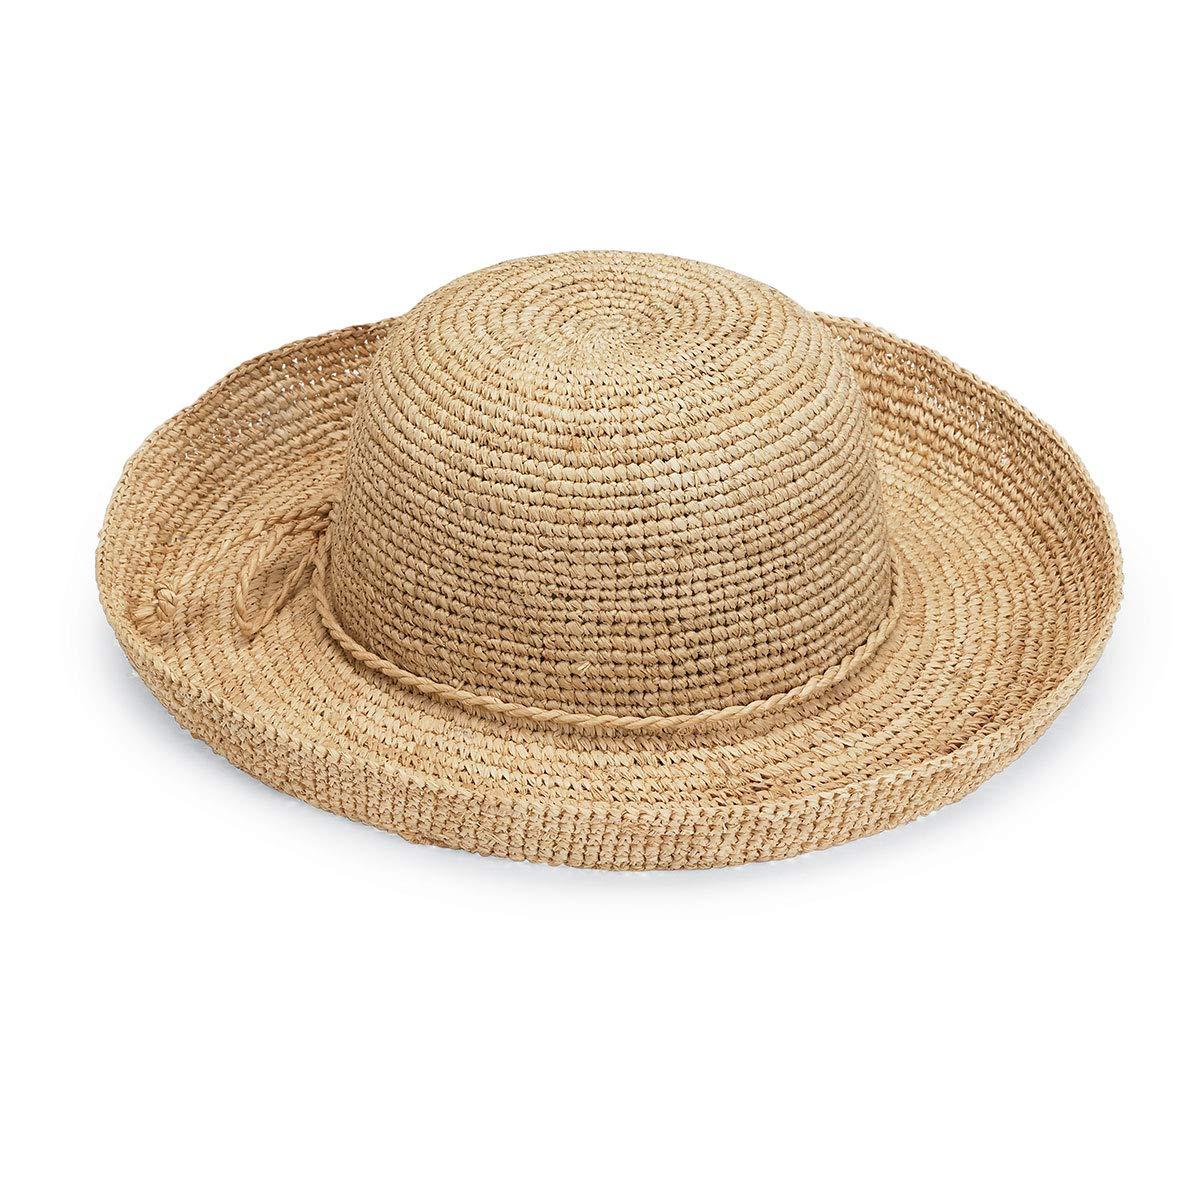 Wallaroo Hat Company Women's Catalina Sun Hat - Modern Handwoven, Twisted Natural Raffia, Wide Brim, Designed in Australia, Natural